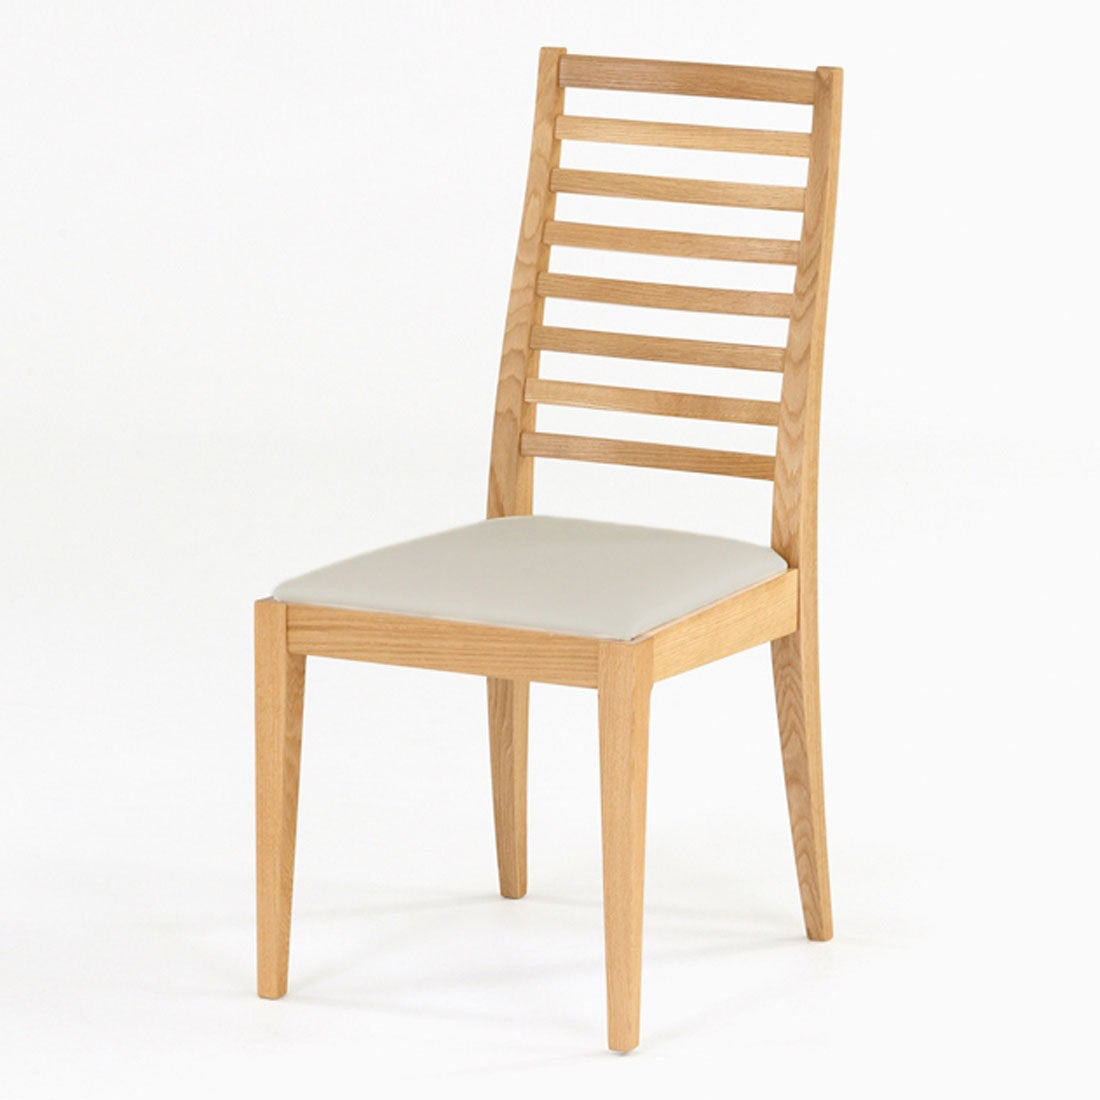 IDC OTSUKA/大塚家具 椅子 N005 #PVC/WOナラ ベージュ (ホワイトオーク)